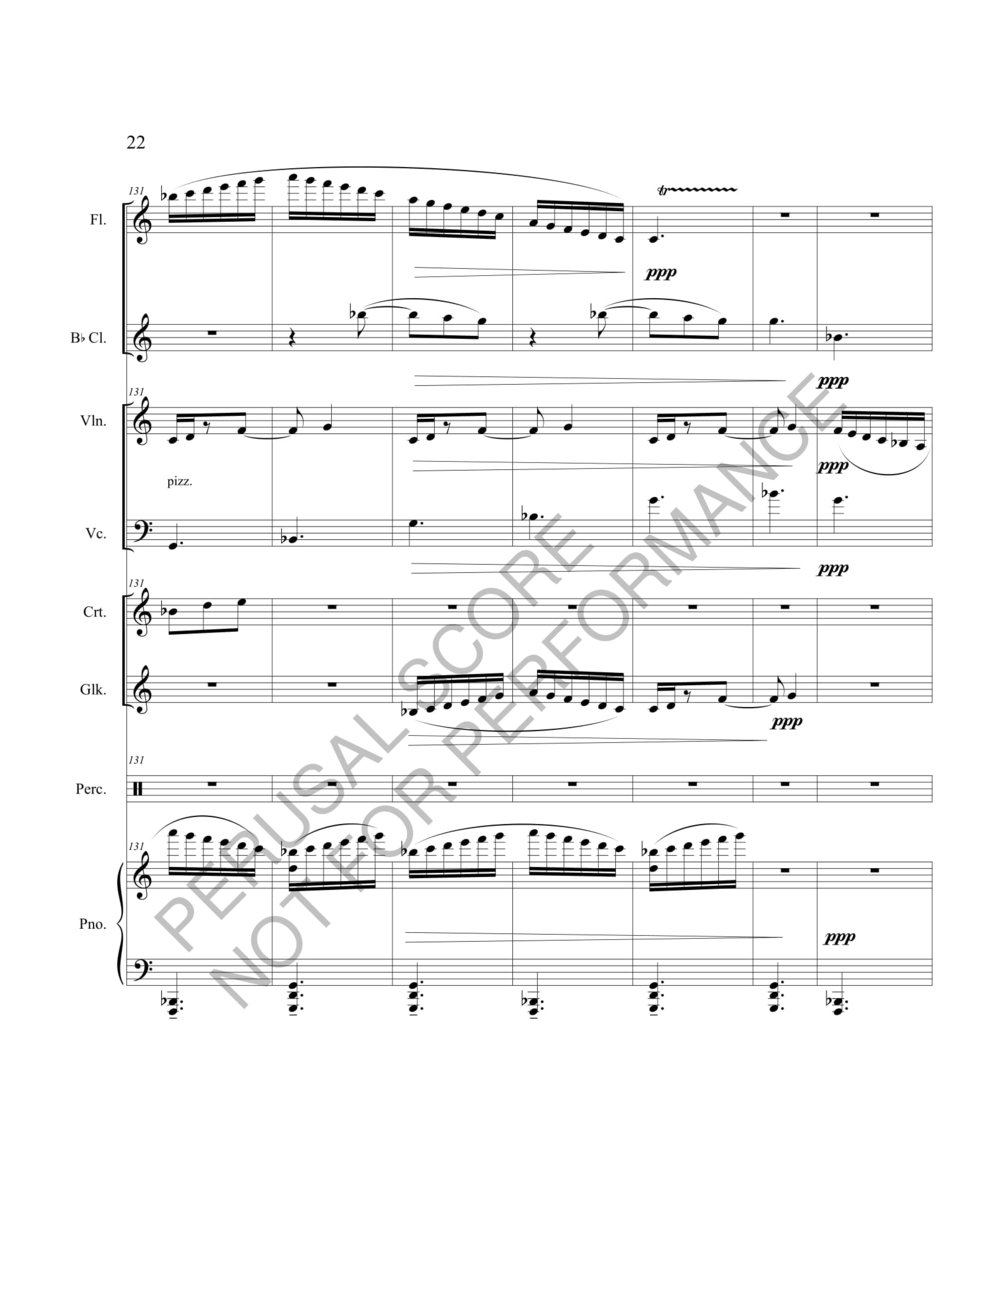 Boyd Terra Liberi Score-watermark-28.jpg